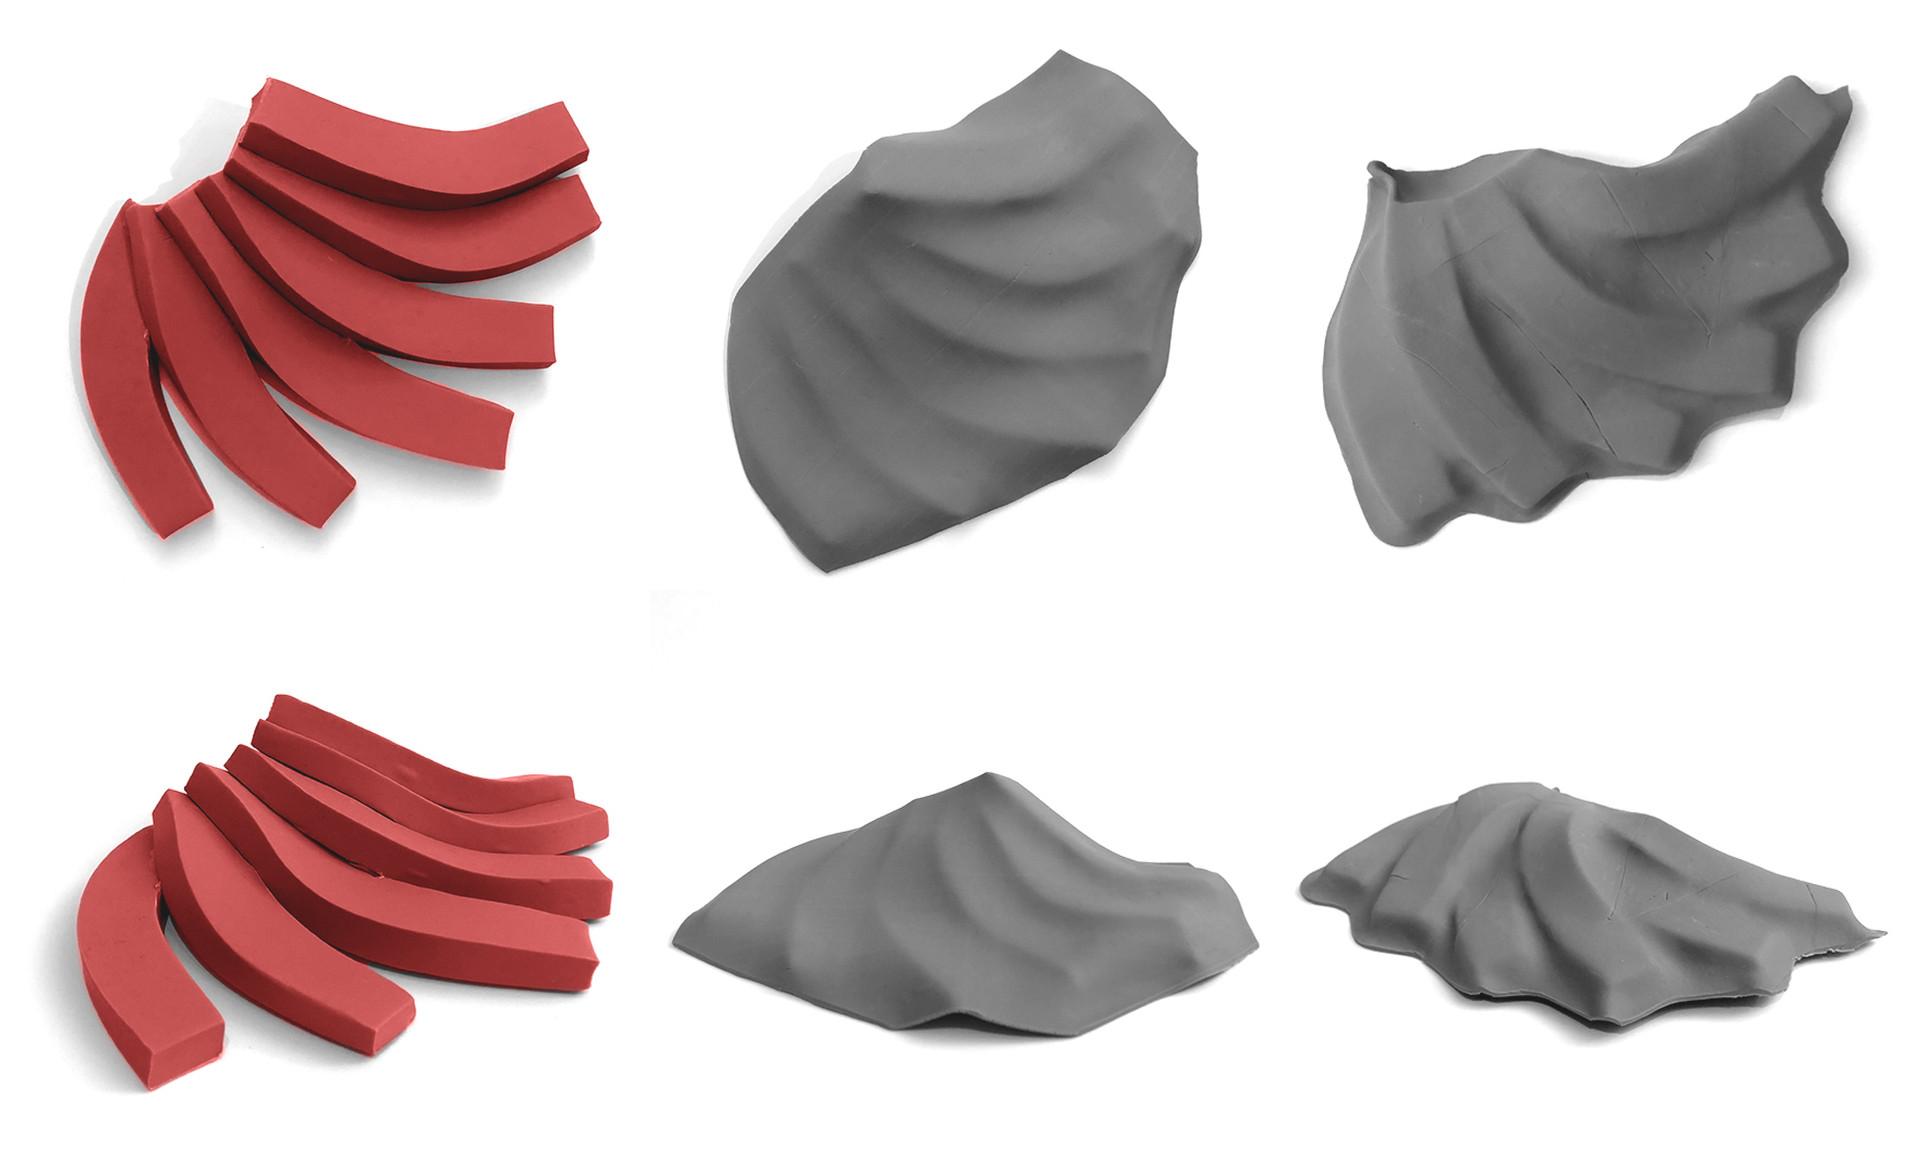 Sculpey Study Models